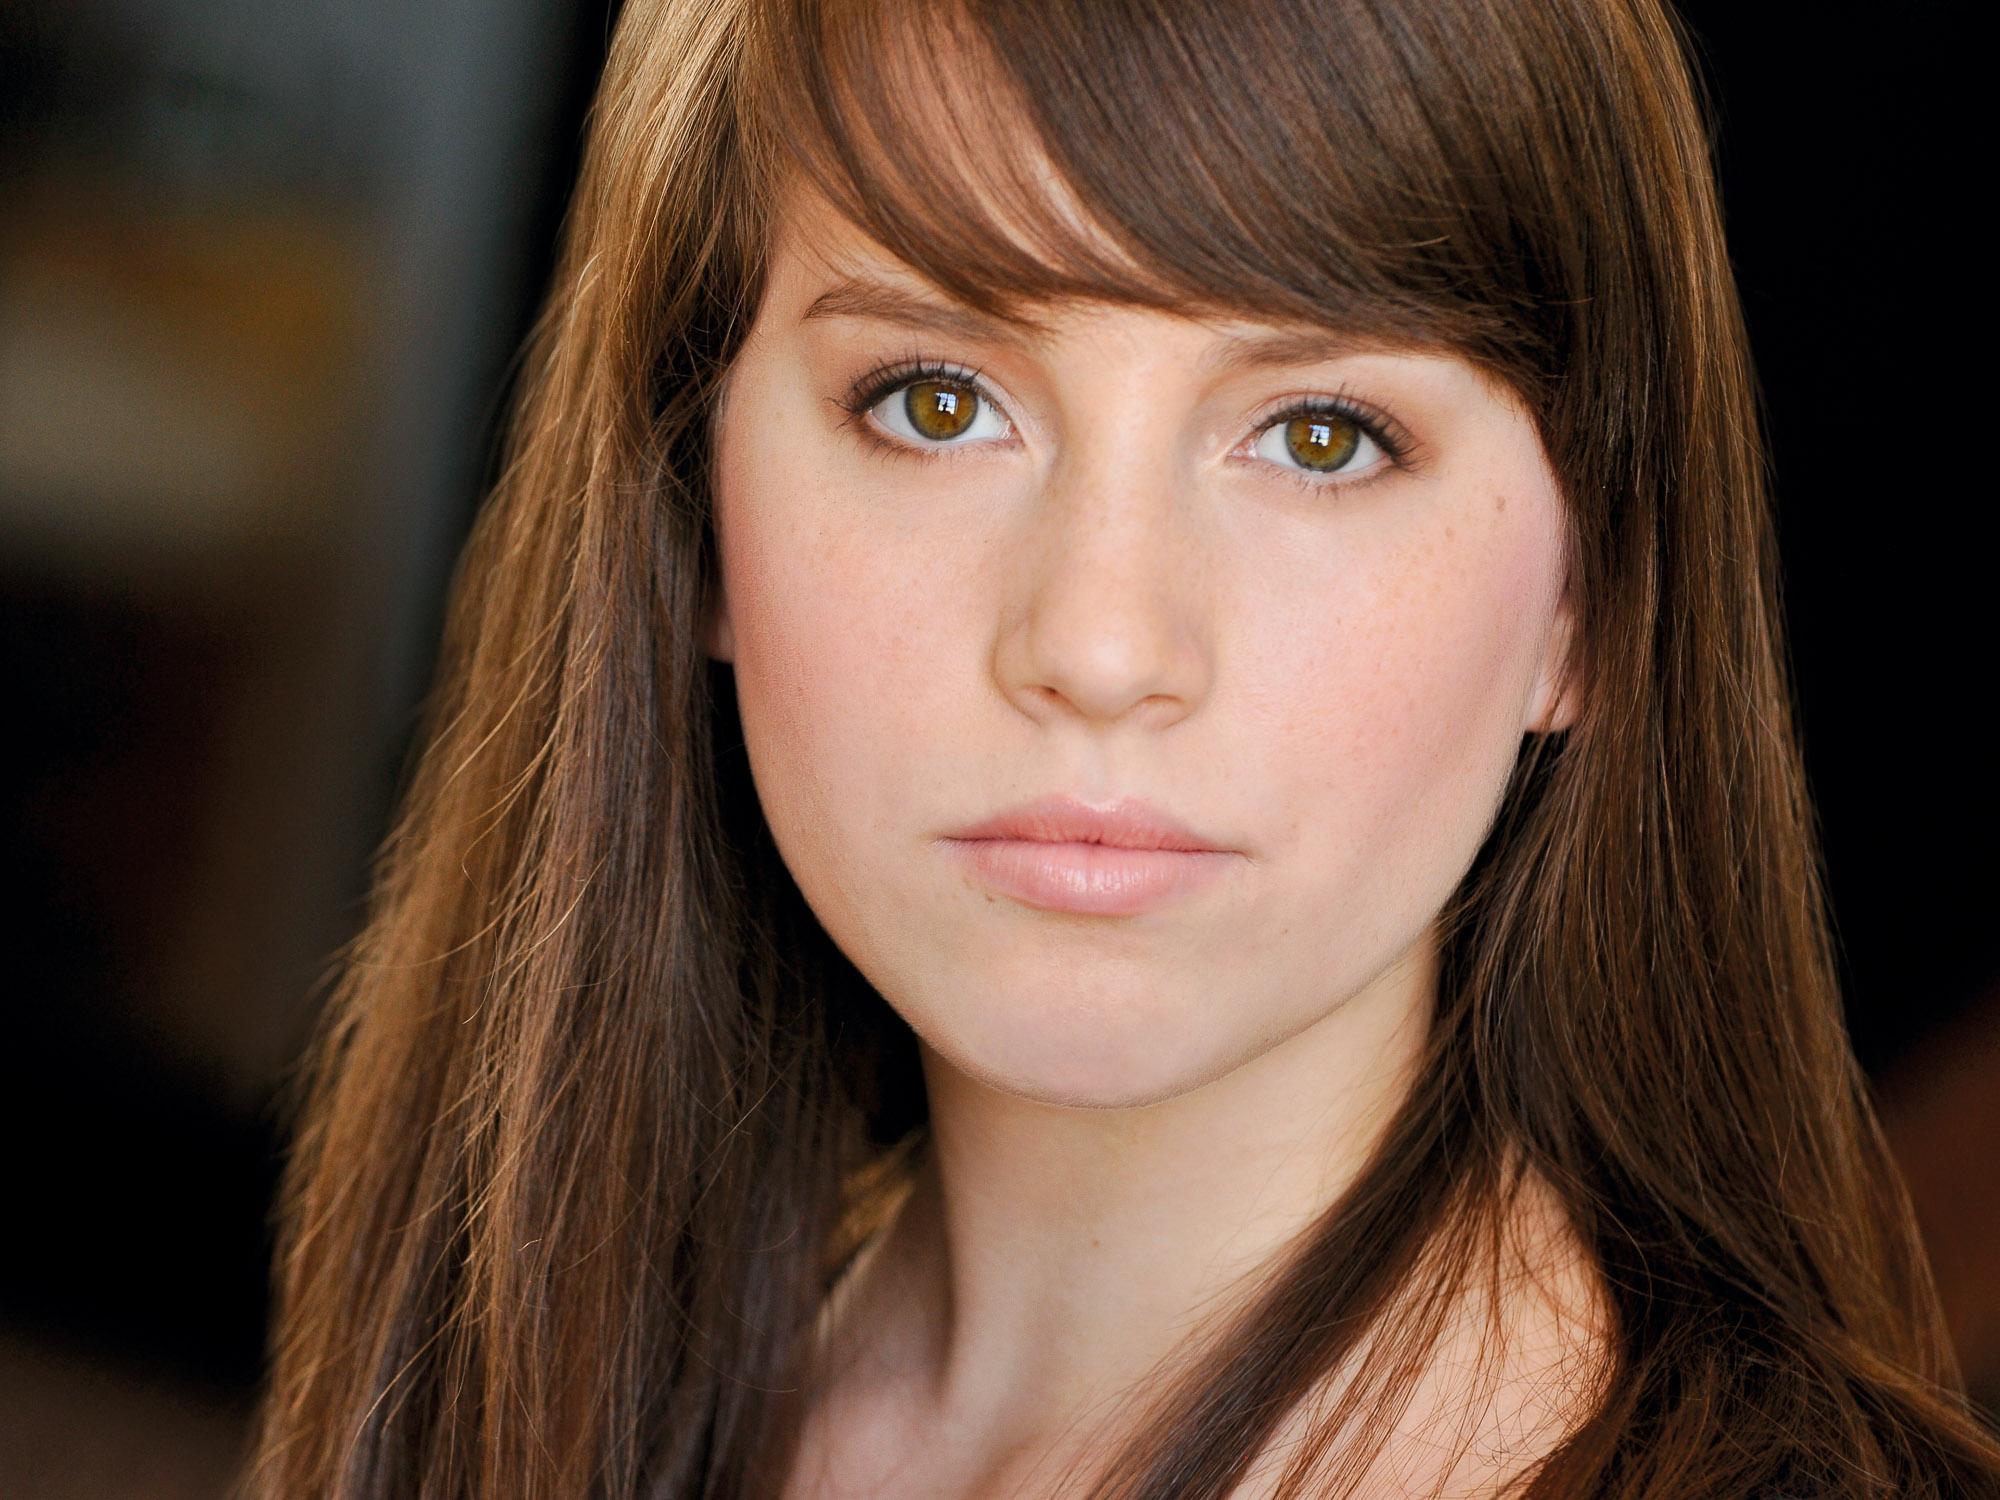 Headshots NYC - Actor Headshots Amelia G